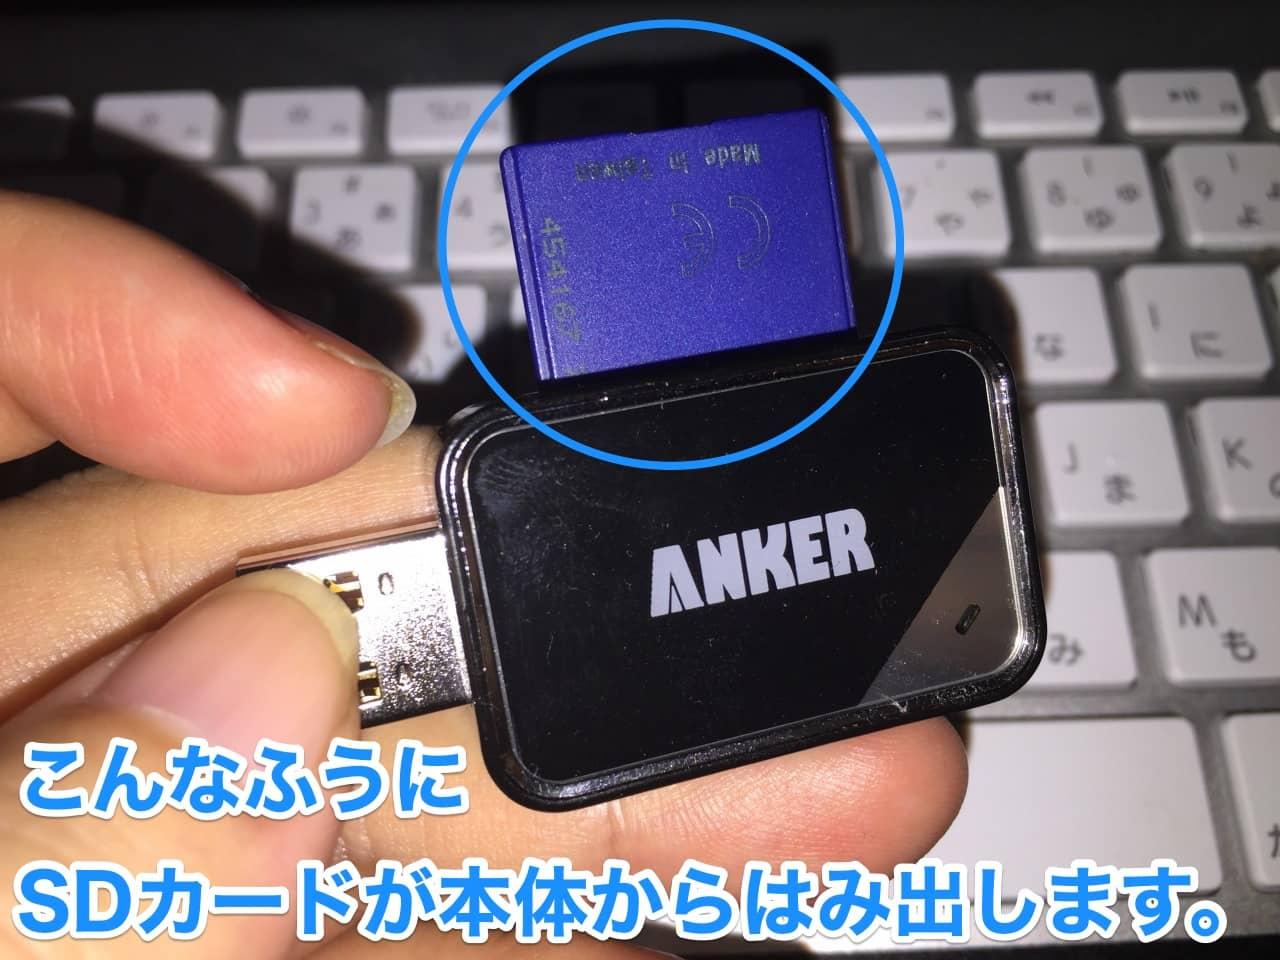 ANKER_SDカードリーダー_カードを挿すと本体からはみ出す